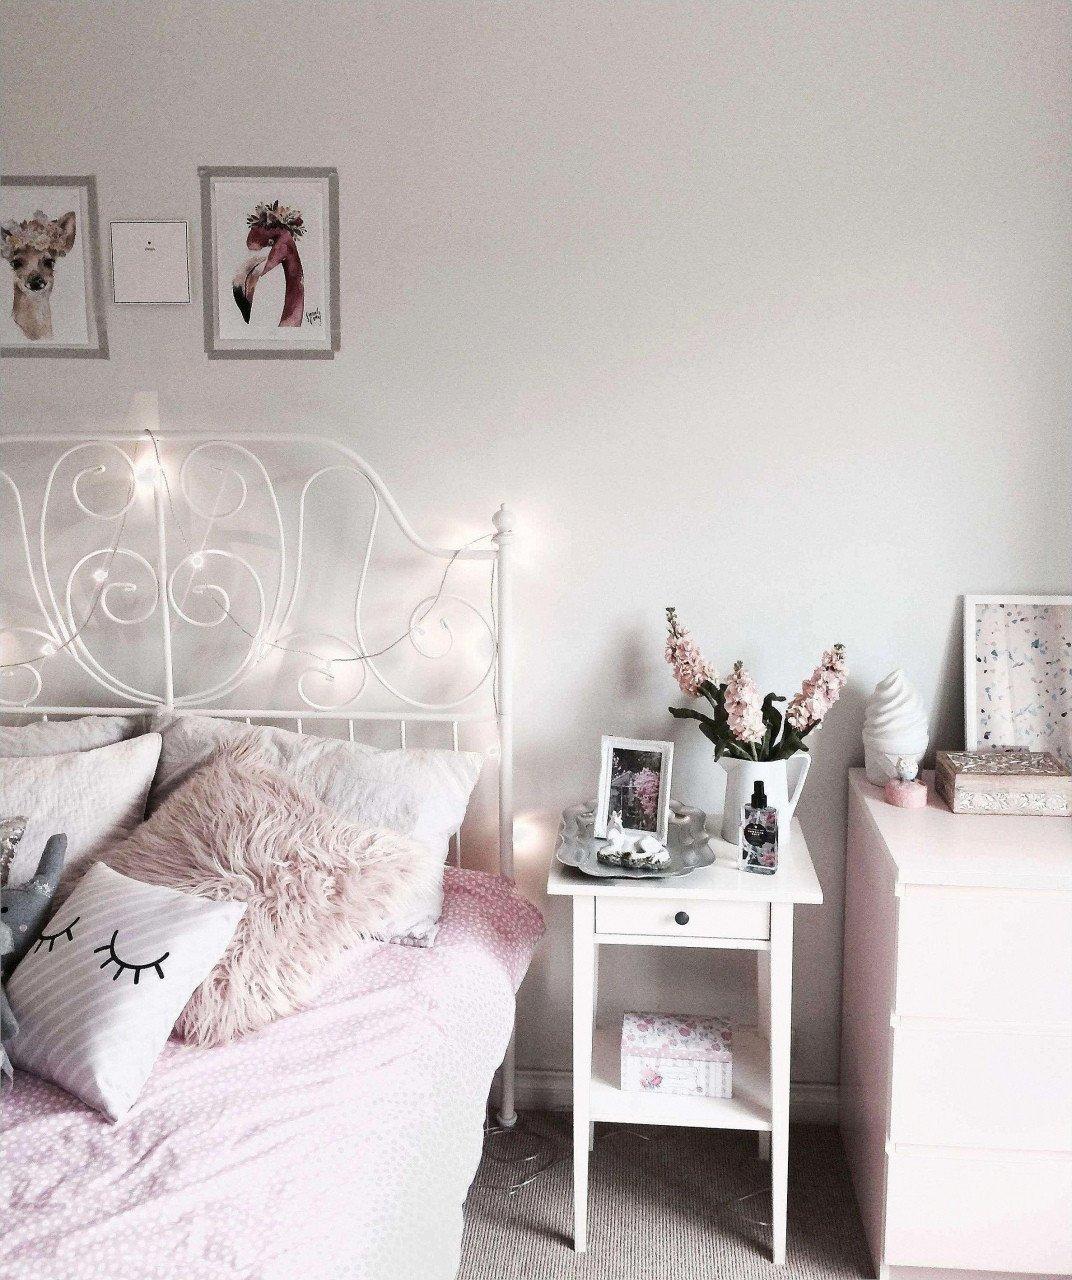 Mens Bedroom Decorating Ideas Lovely Bedroom Ideas for Men — Procura Home Blog